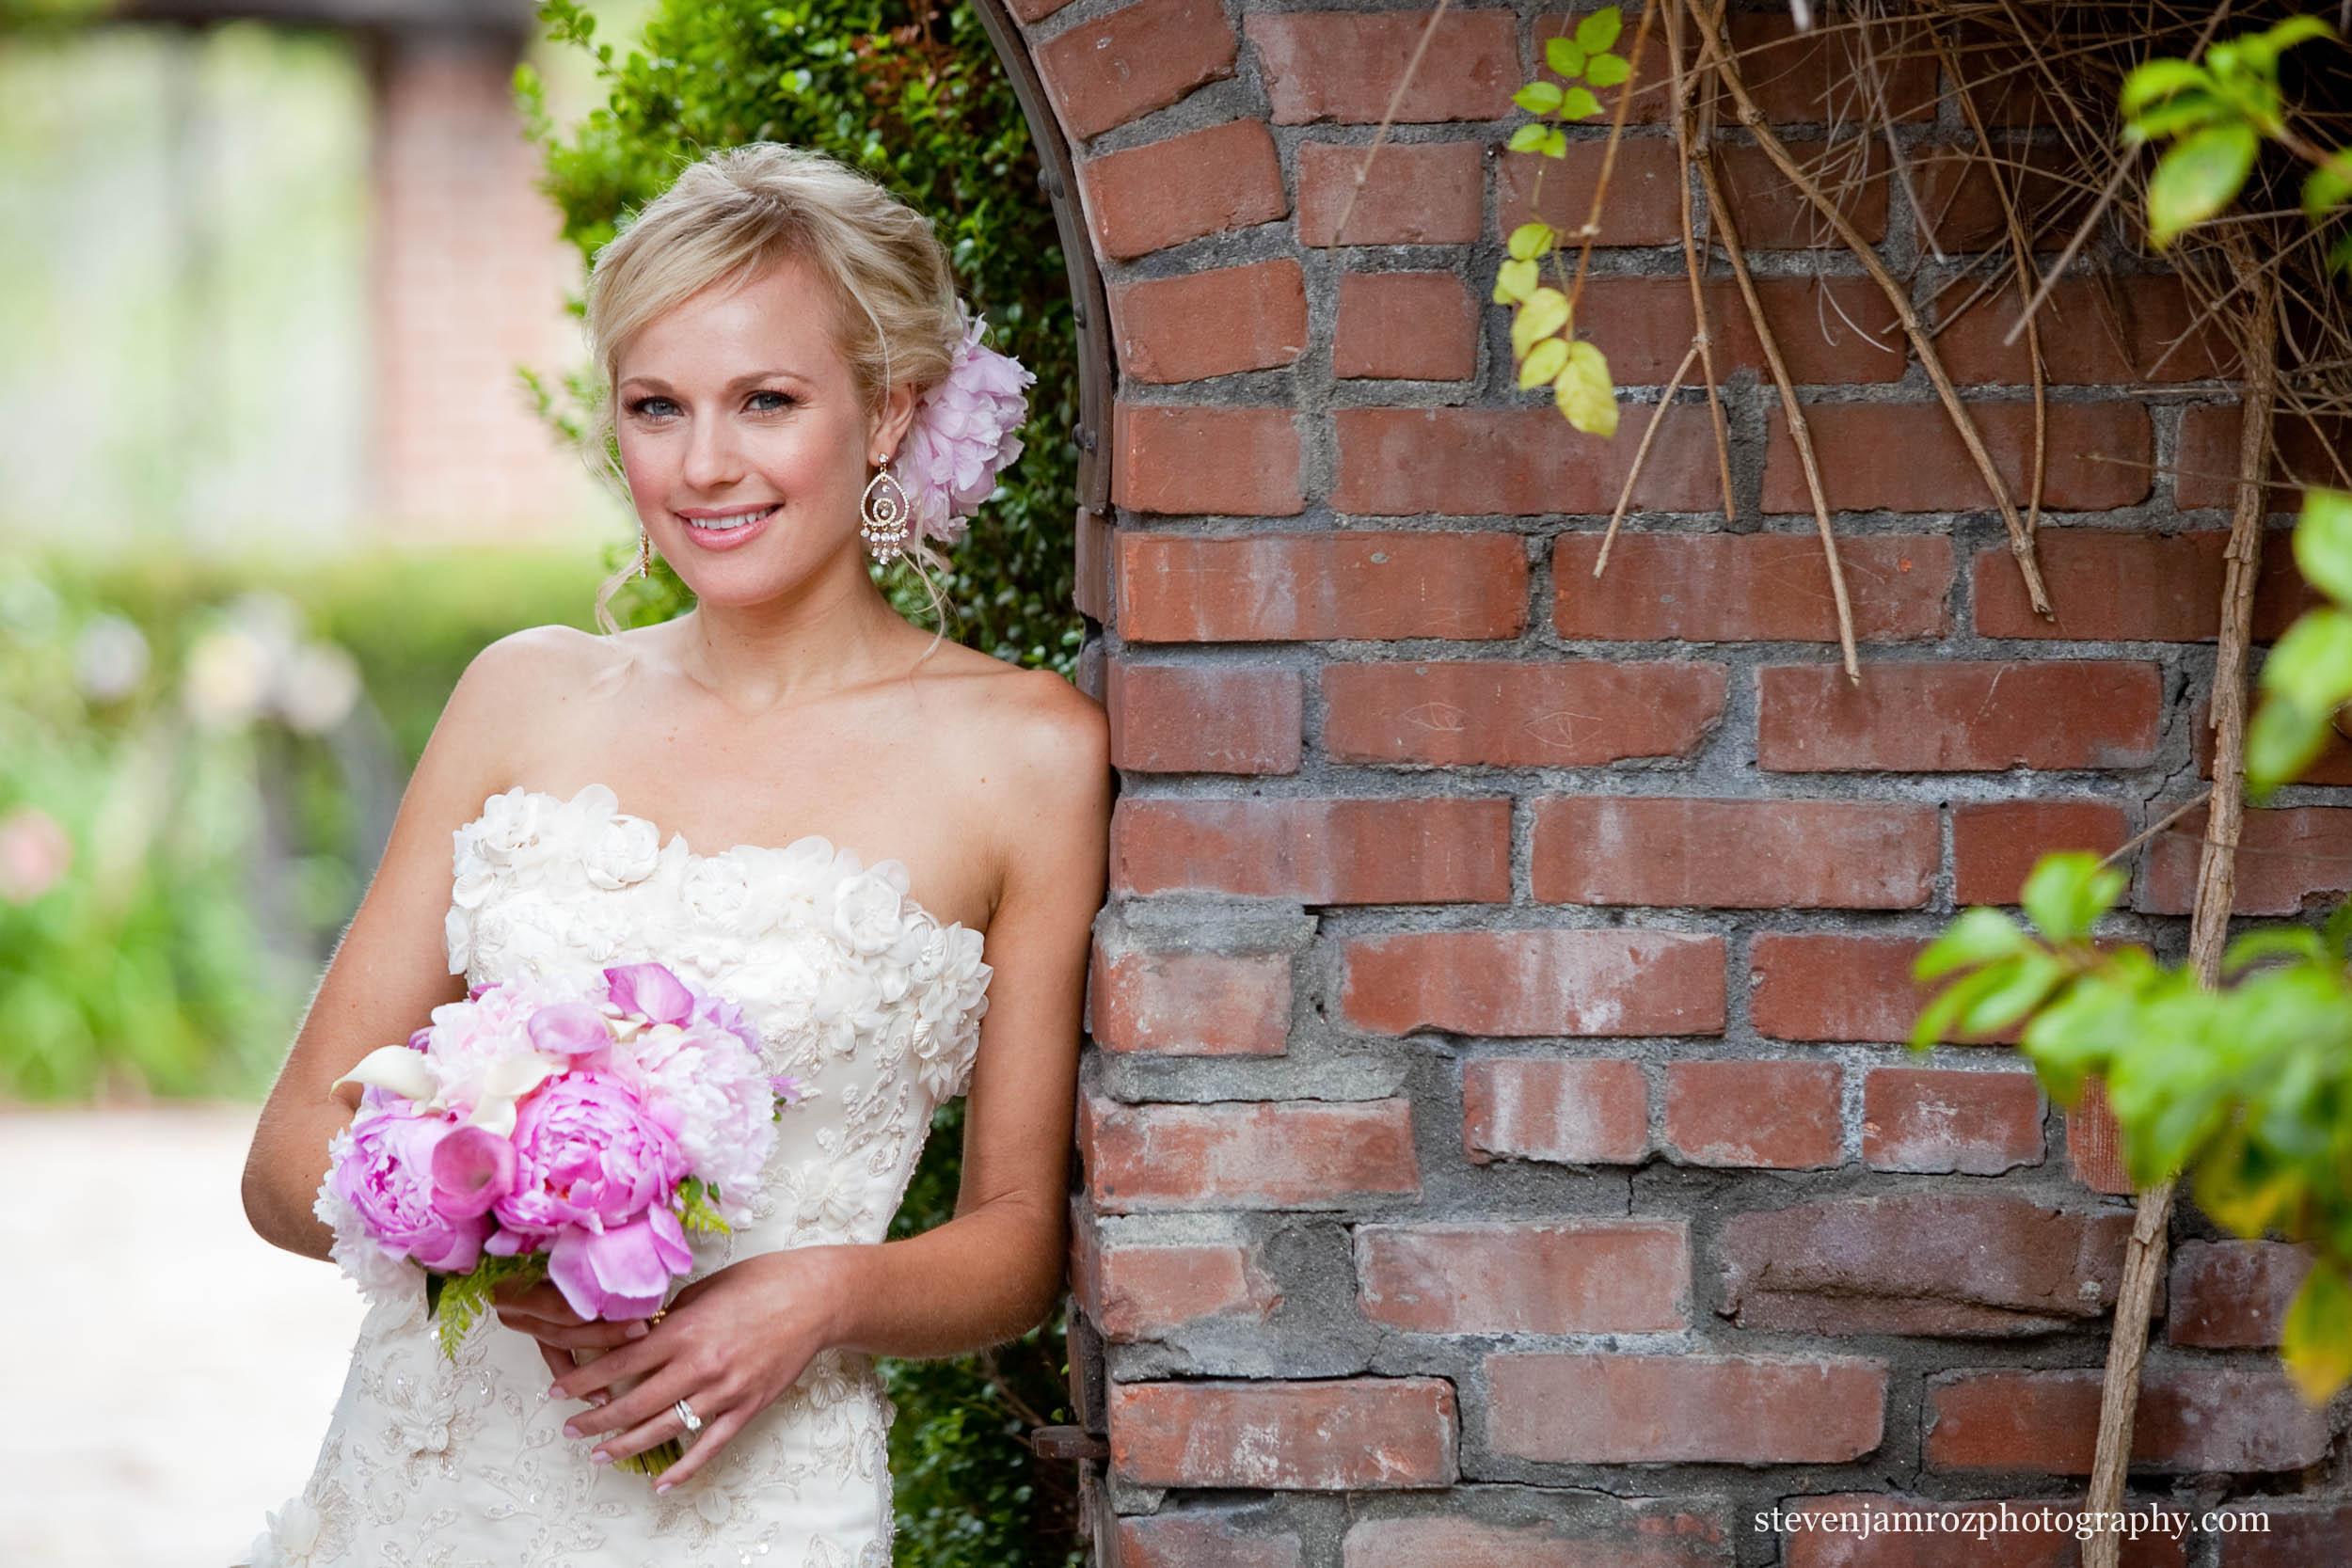 pink-flowers-bride-durham-nc-wedding-venues-photographer-0846.jpg